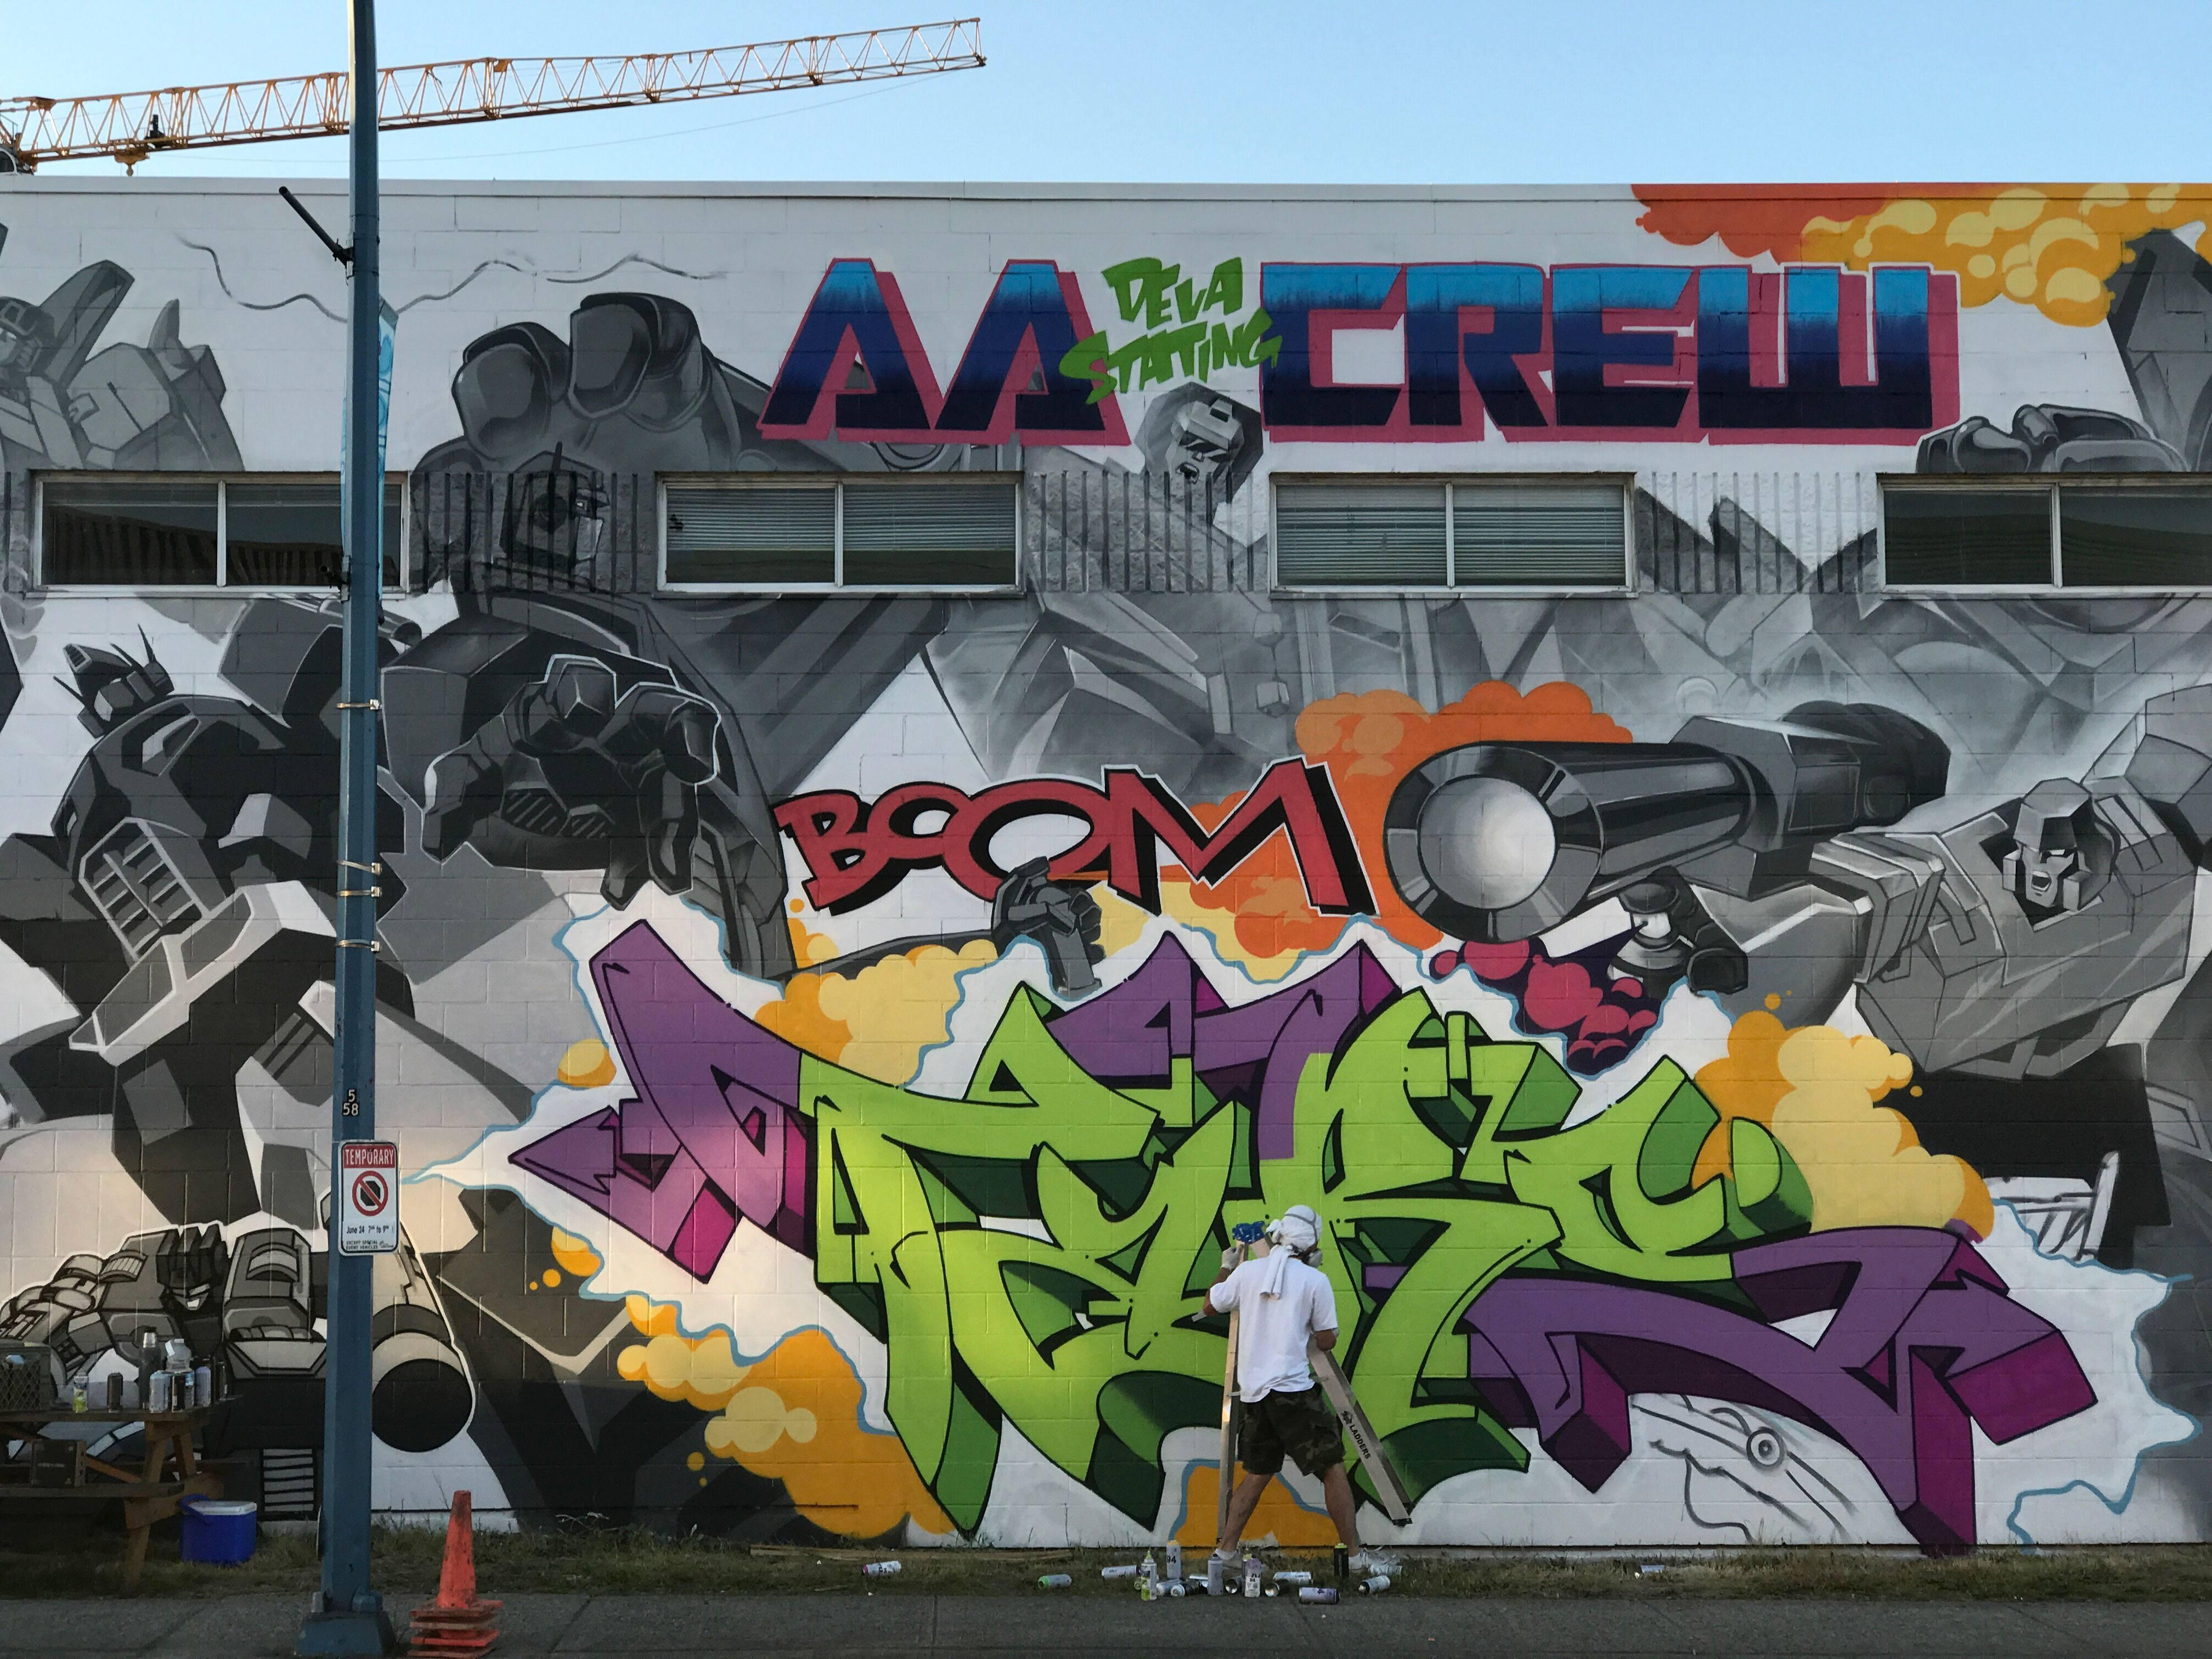 Muralfestimage